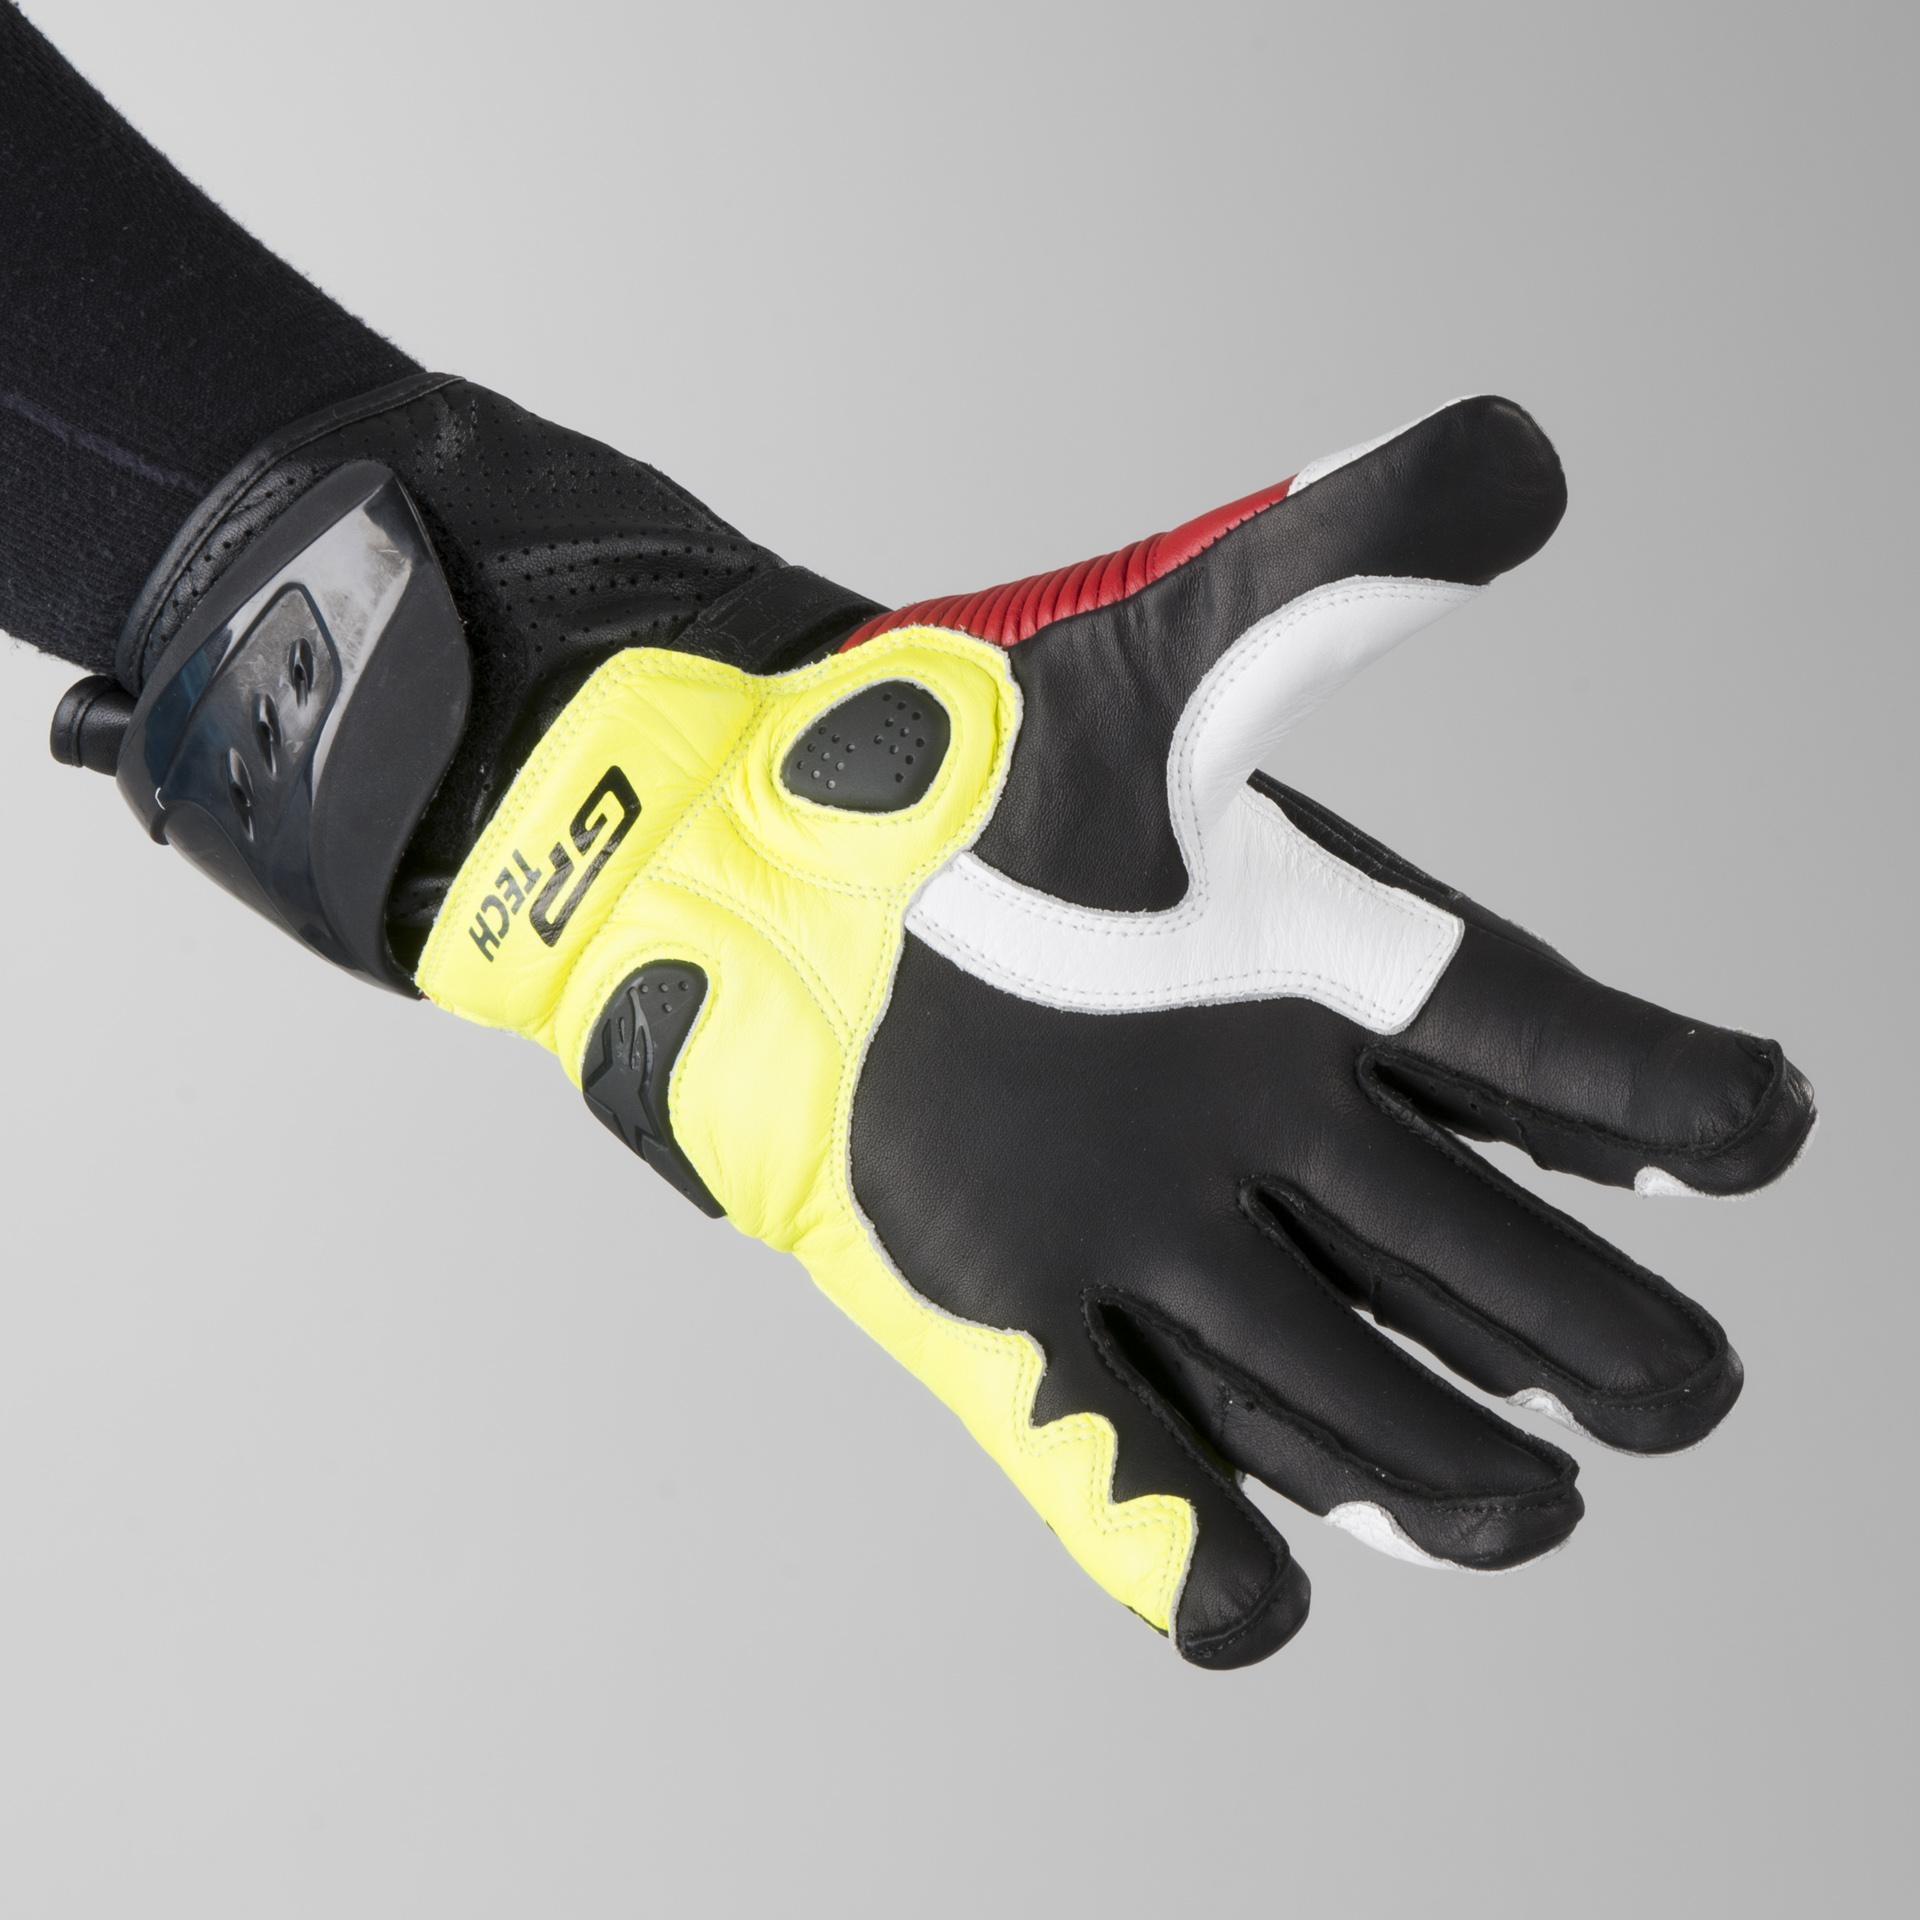 Alpinestars GP Tech Gloves Black Red Fluorescent Buy now